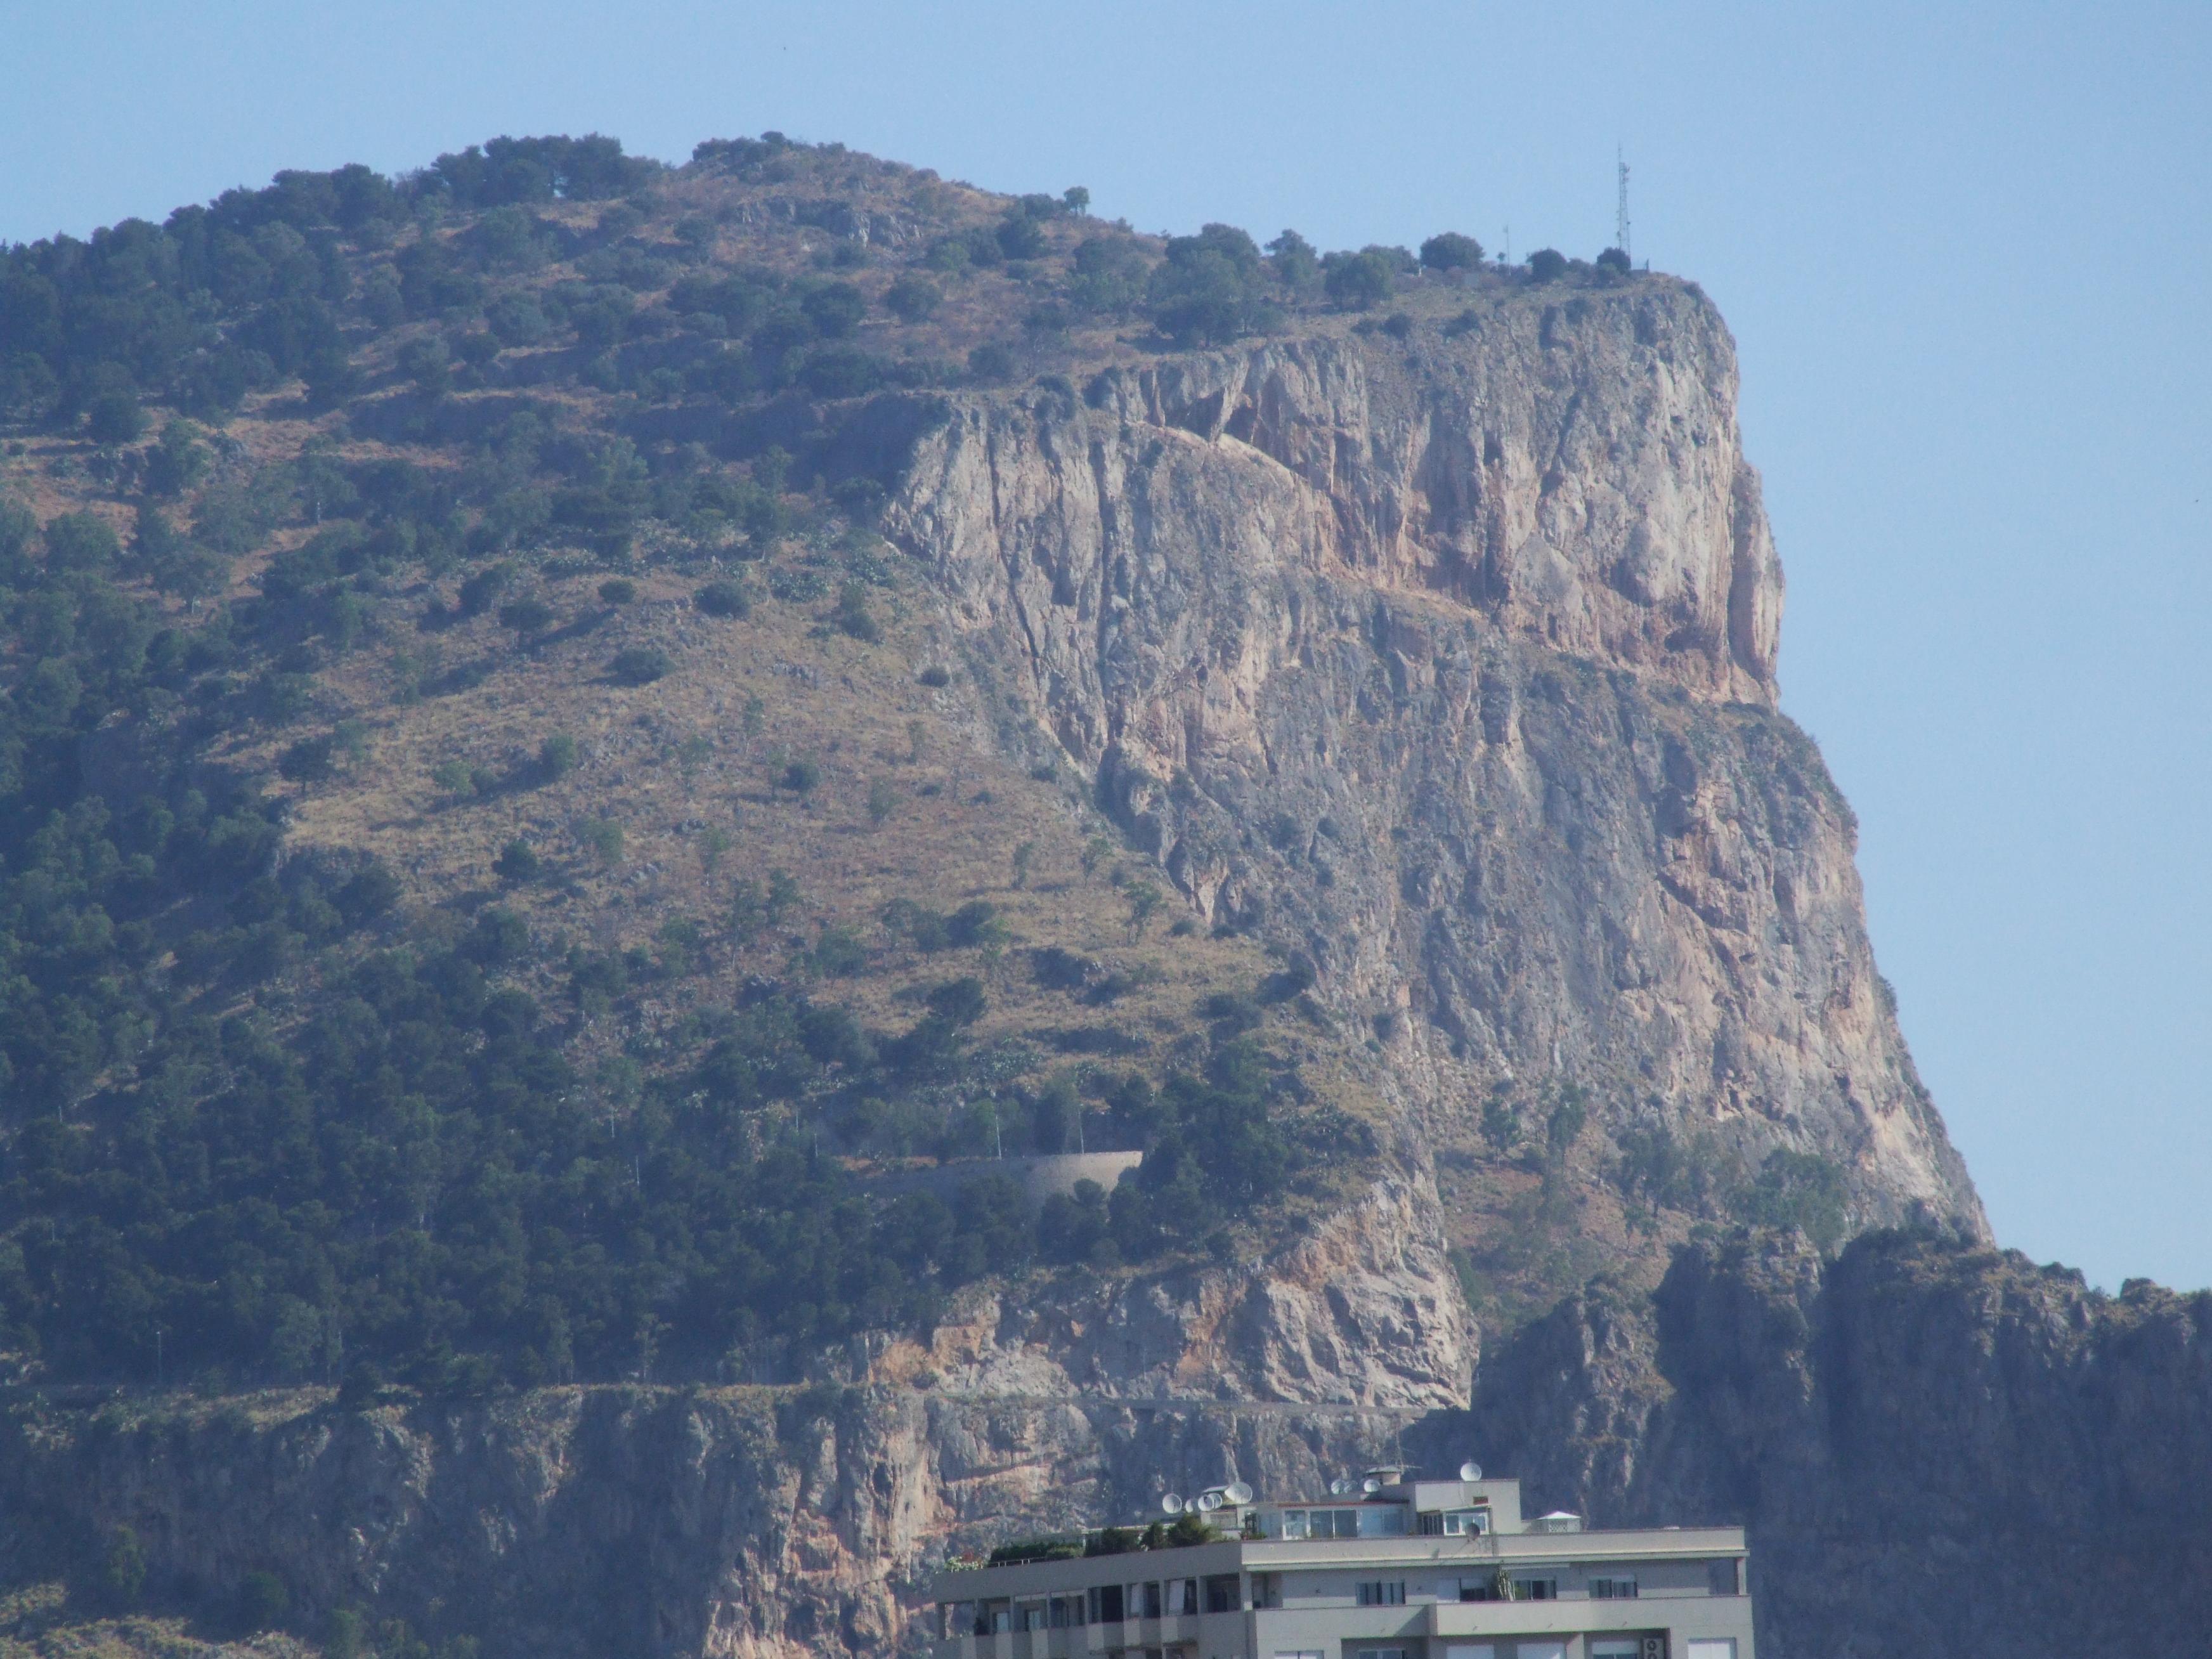 Palermo-sicilia-italy - creative commons by gnuckx photo